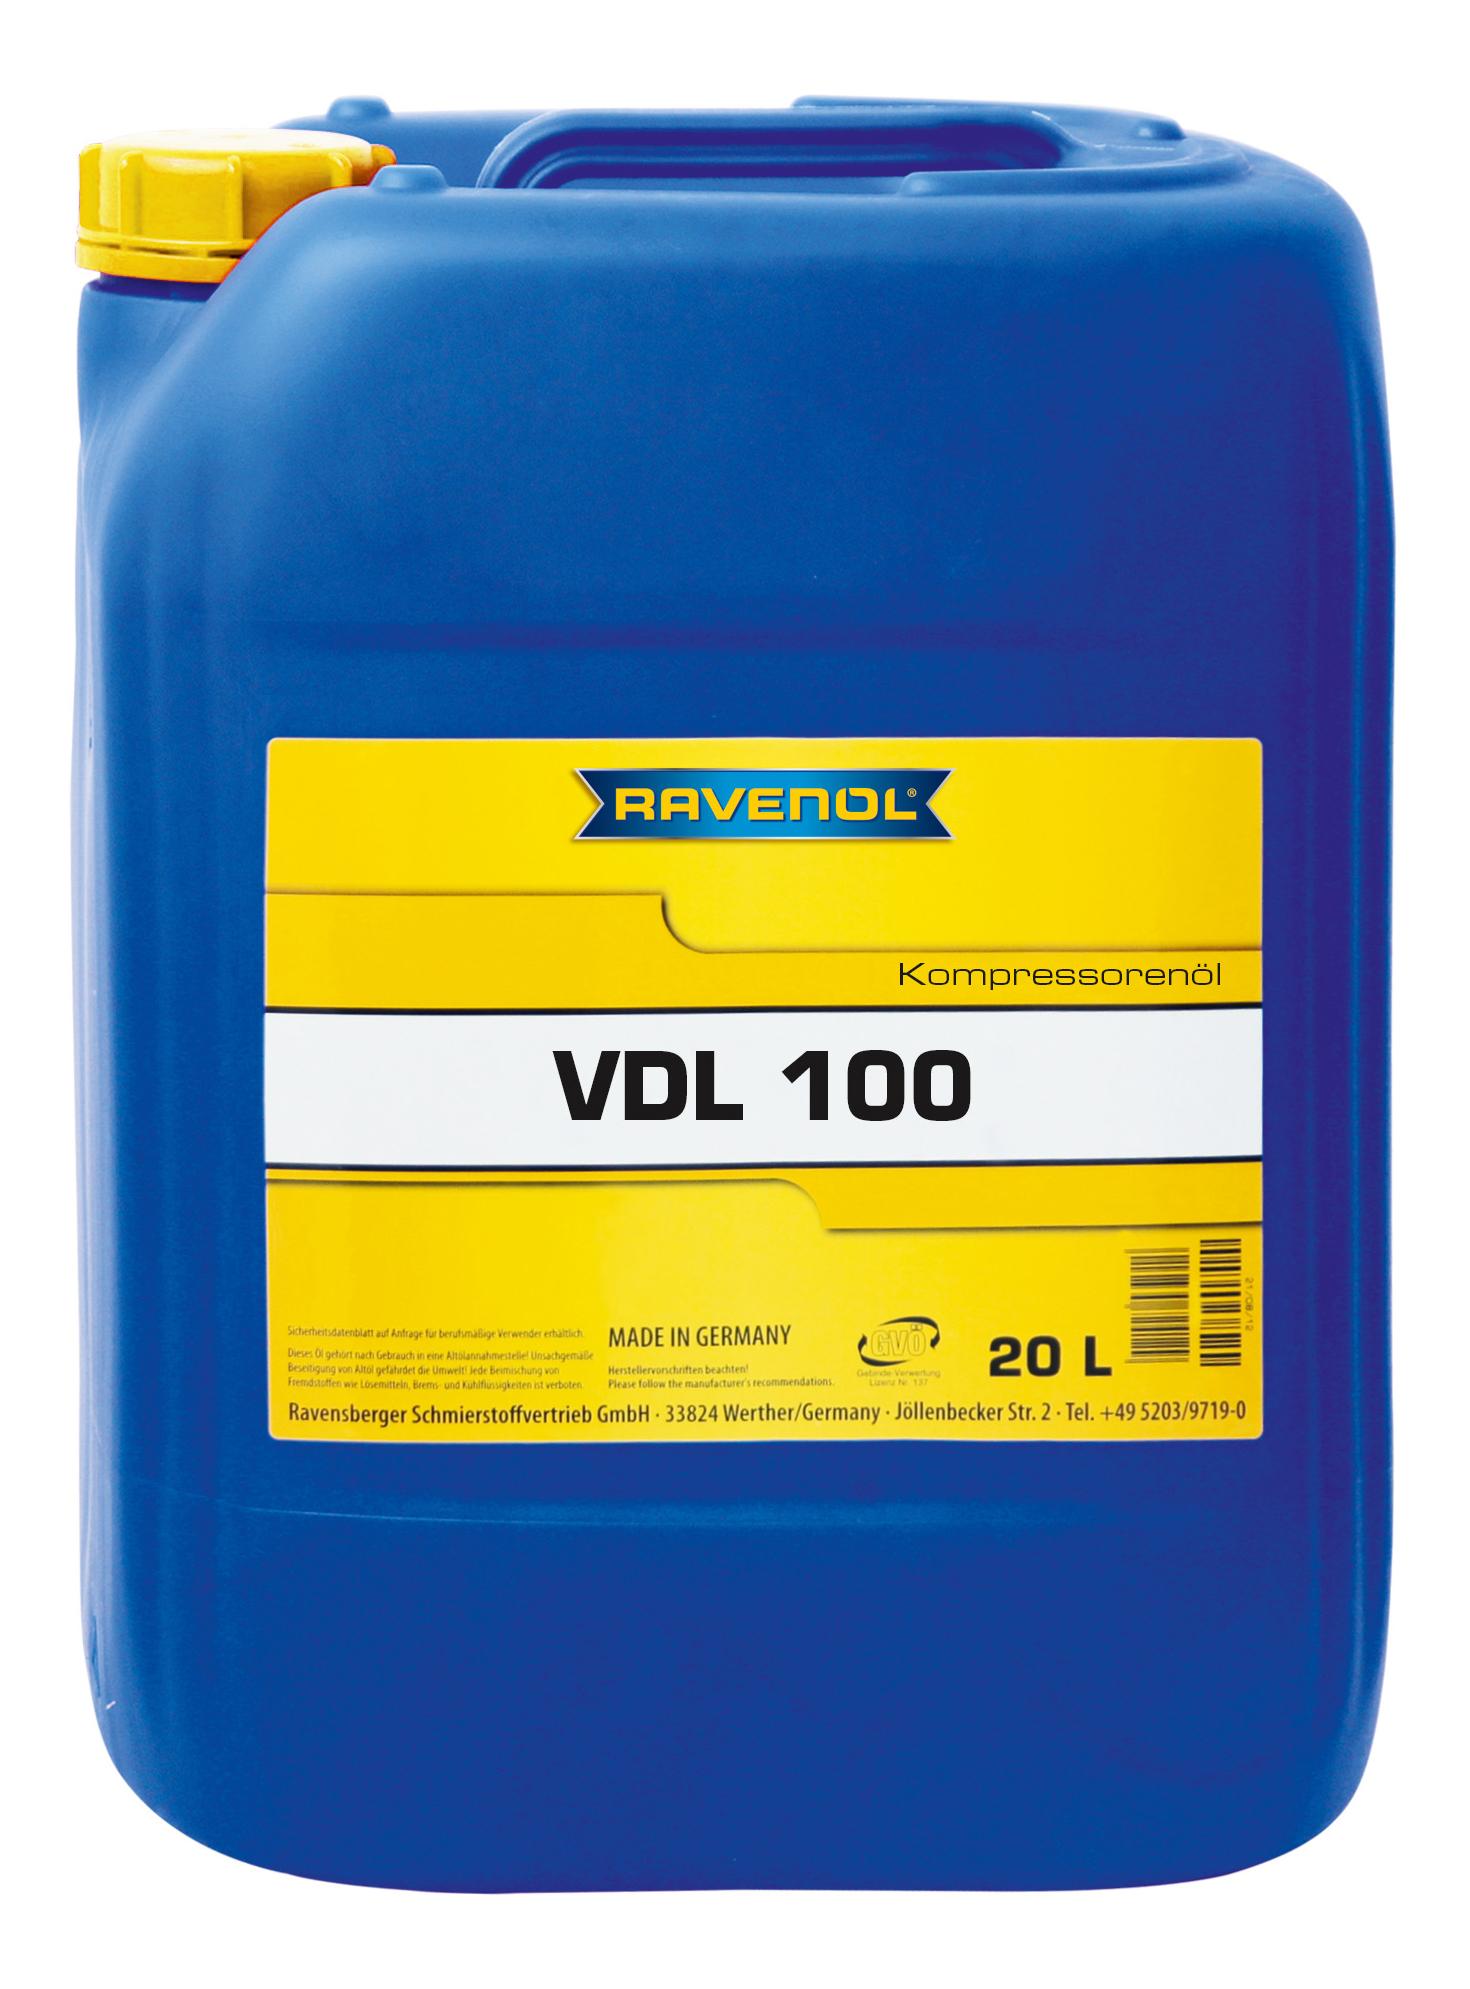 Компрессорное масло RAVENOL Kompressorenoel 20л 1330100-020-01-999